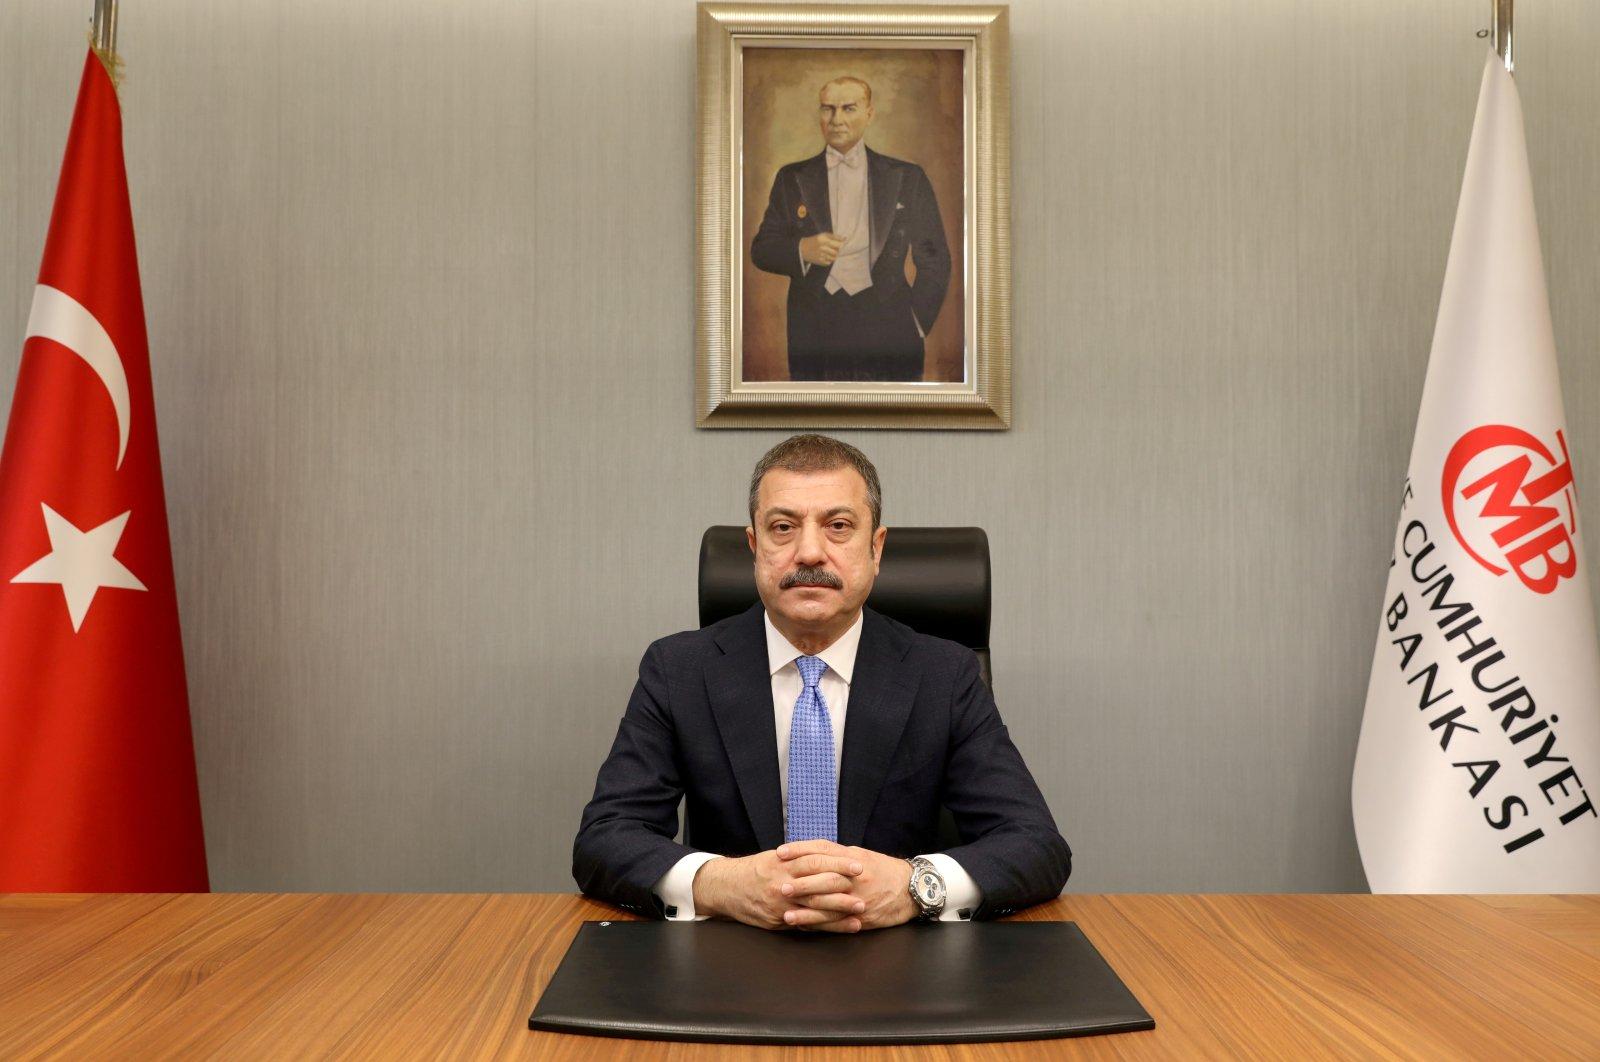 Central Bank of the Republic of Turkey (CBRT) Governor Şahap Kavcıoğlu sits at his office in Ankara, Turkey, March 21, 2021. (CBRT via Reuters)